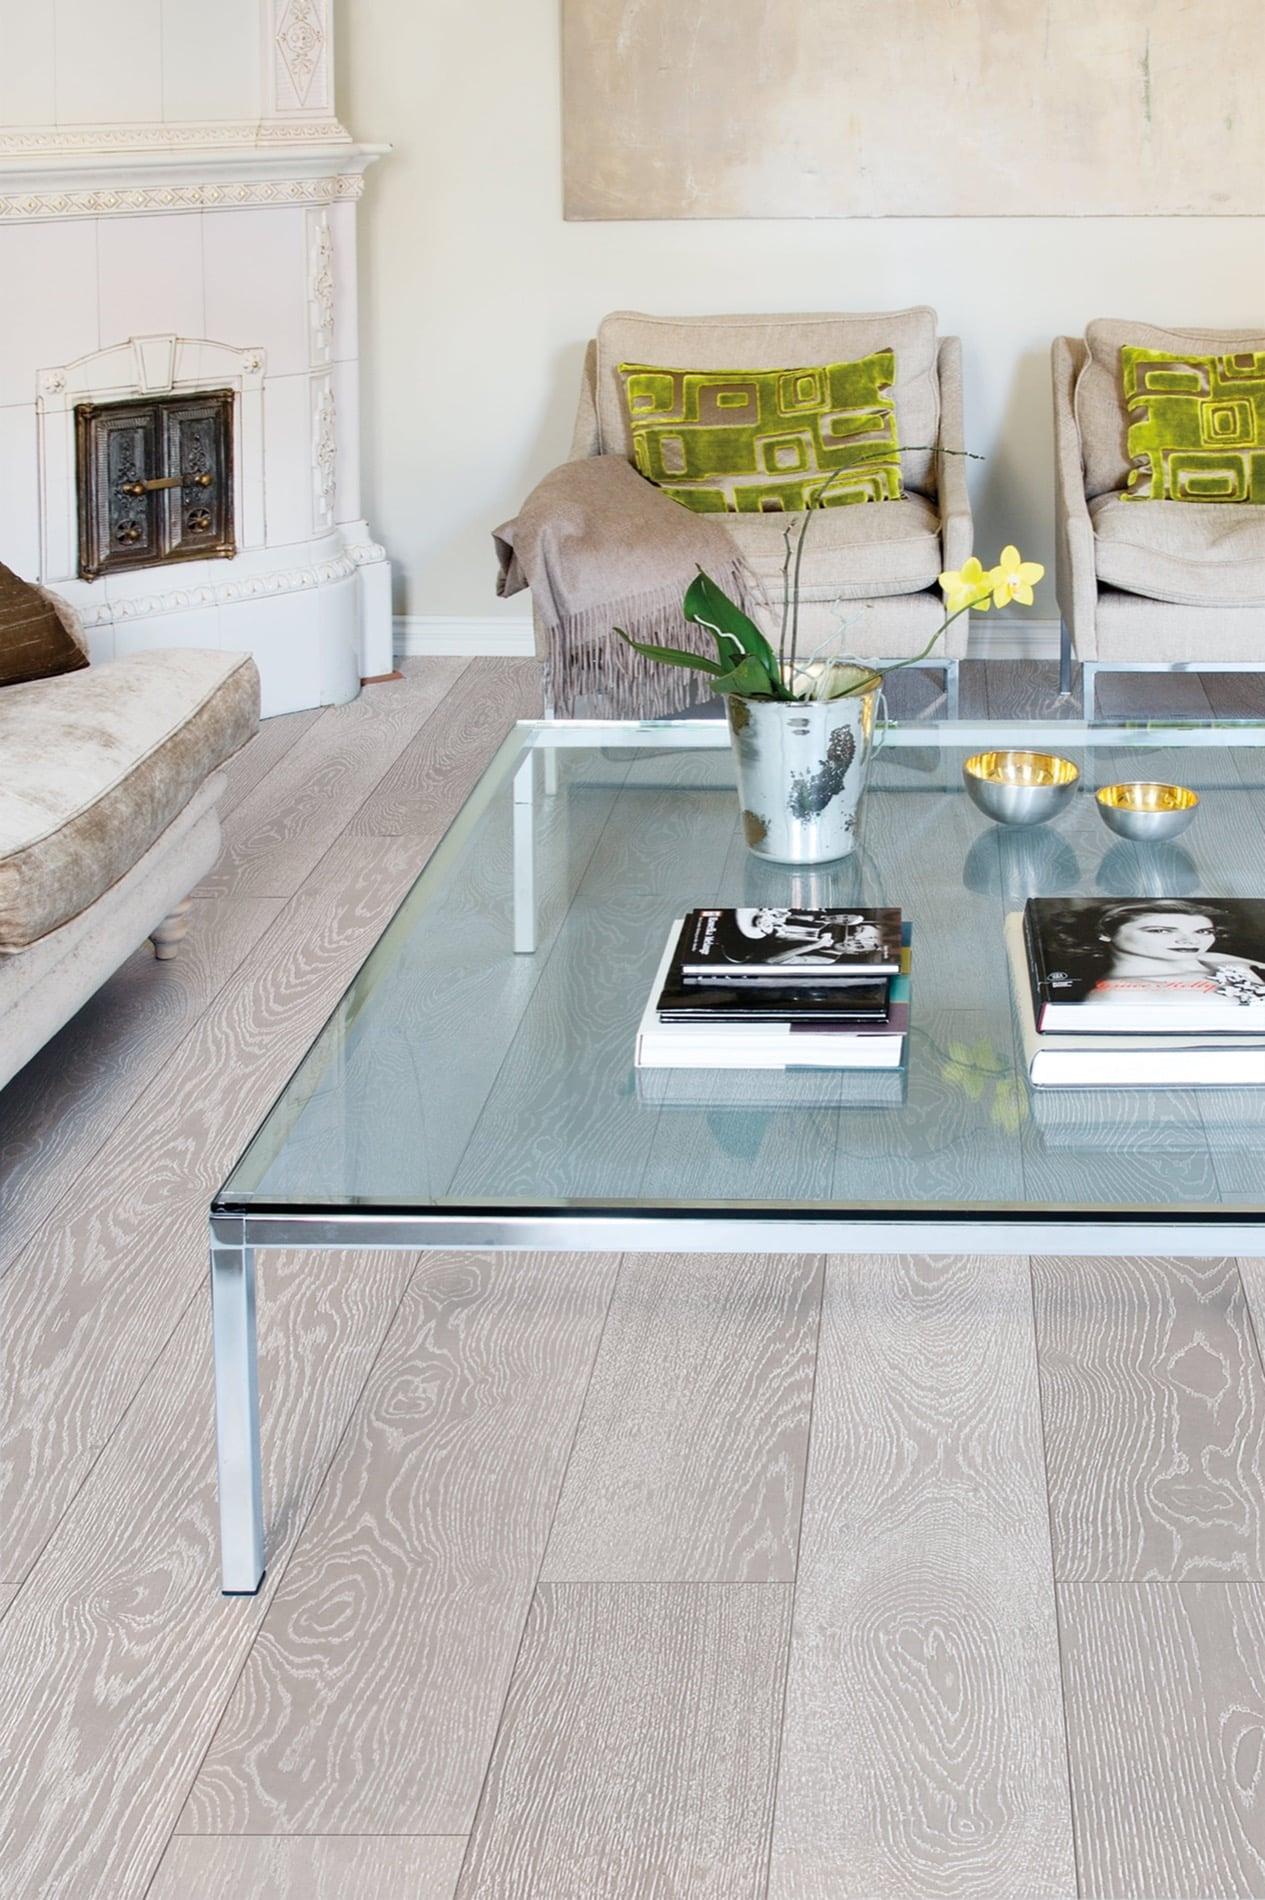 Timberwise parketti puulattia wooden floor parquet Tammi Oak Silver_pysty1